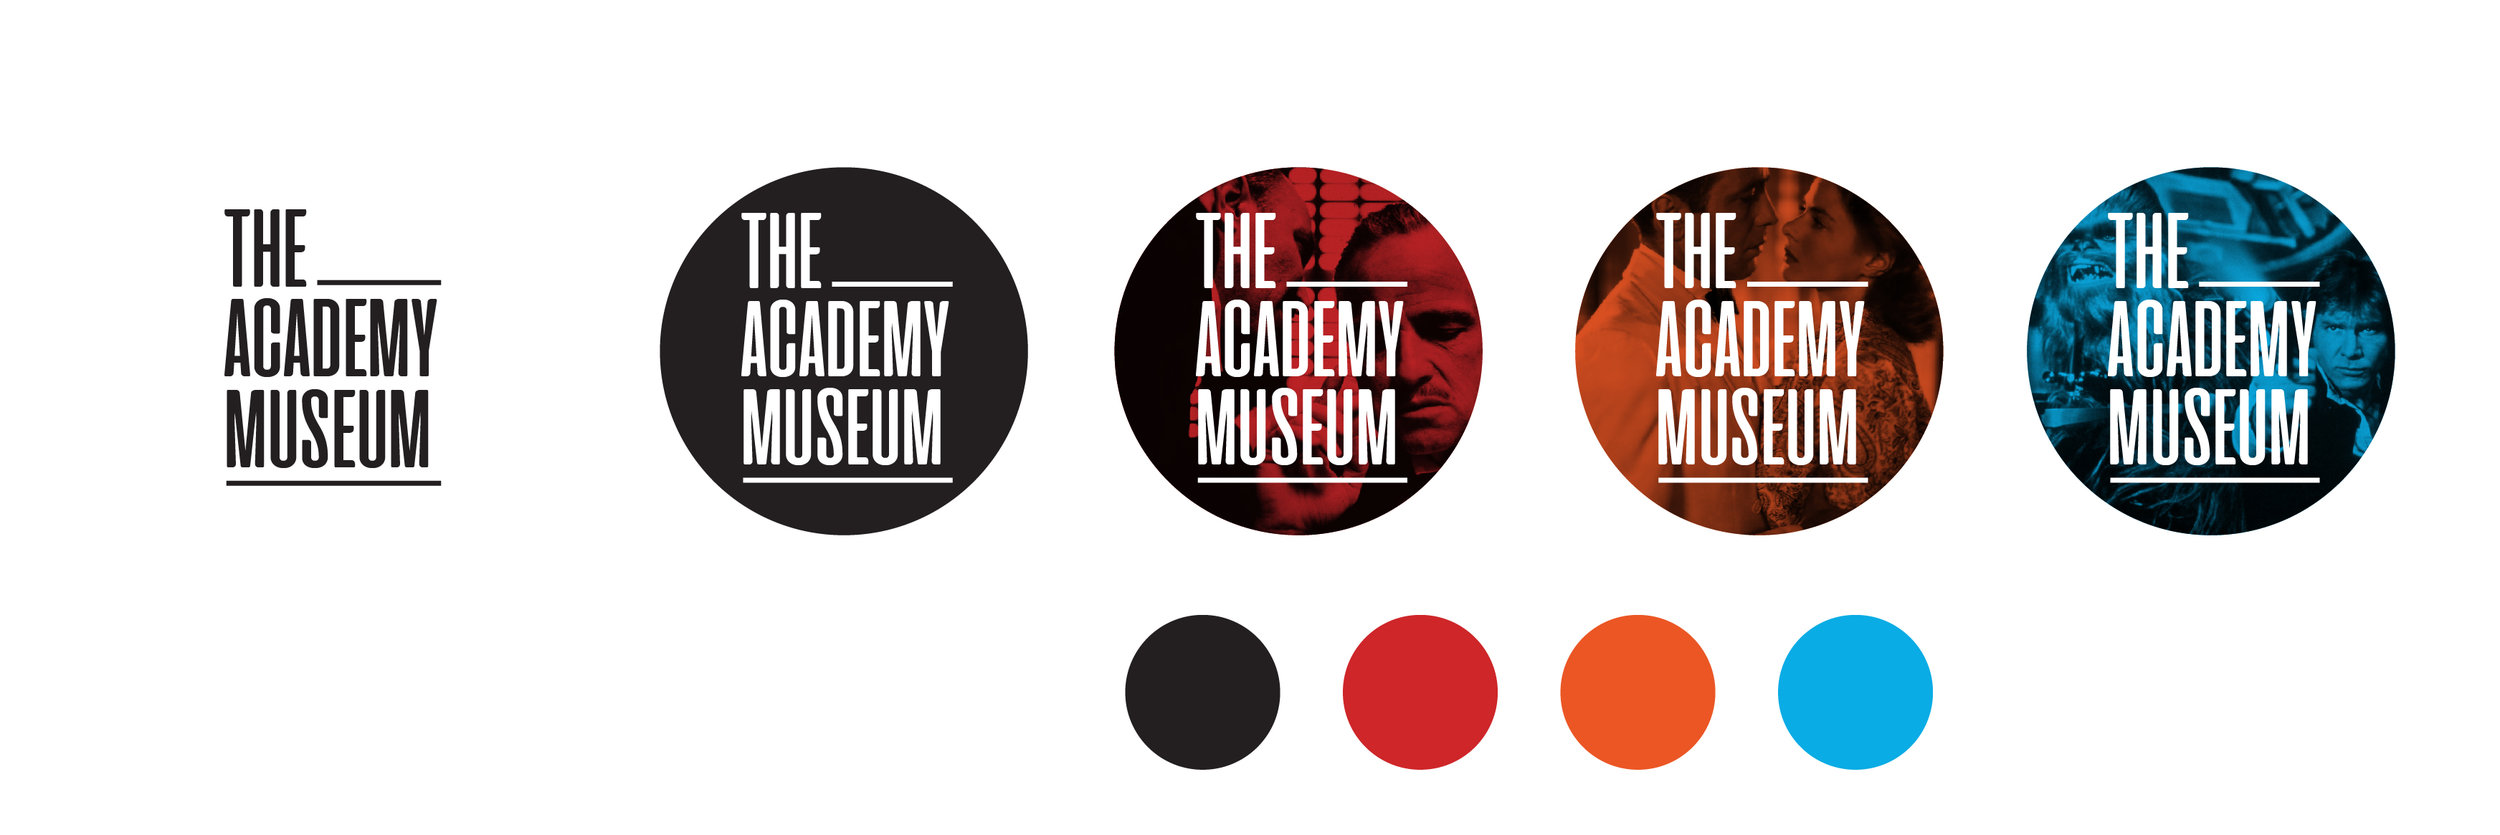 academymuseumidentity_040219-04.jpg